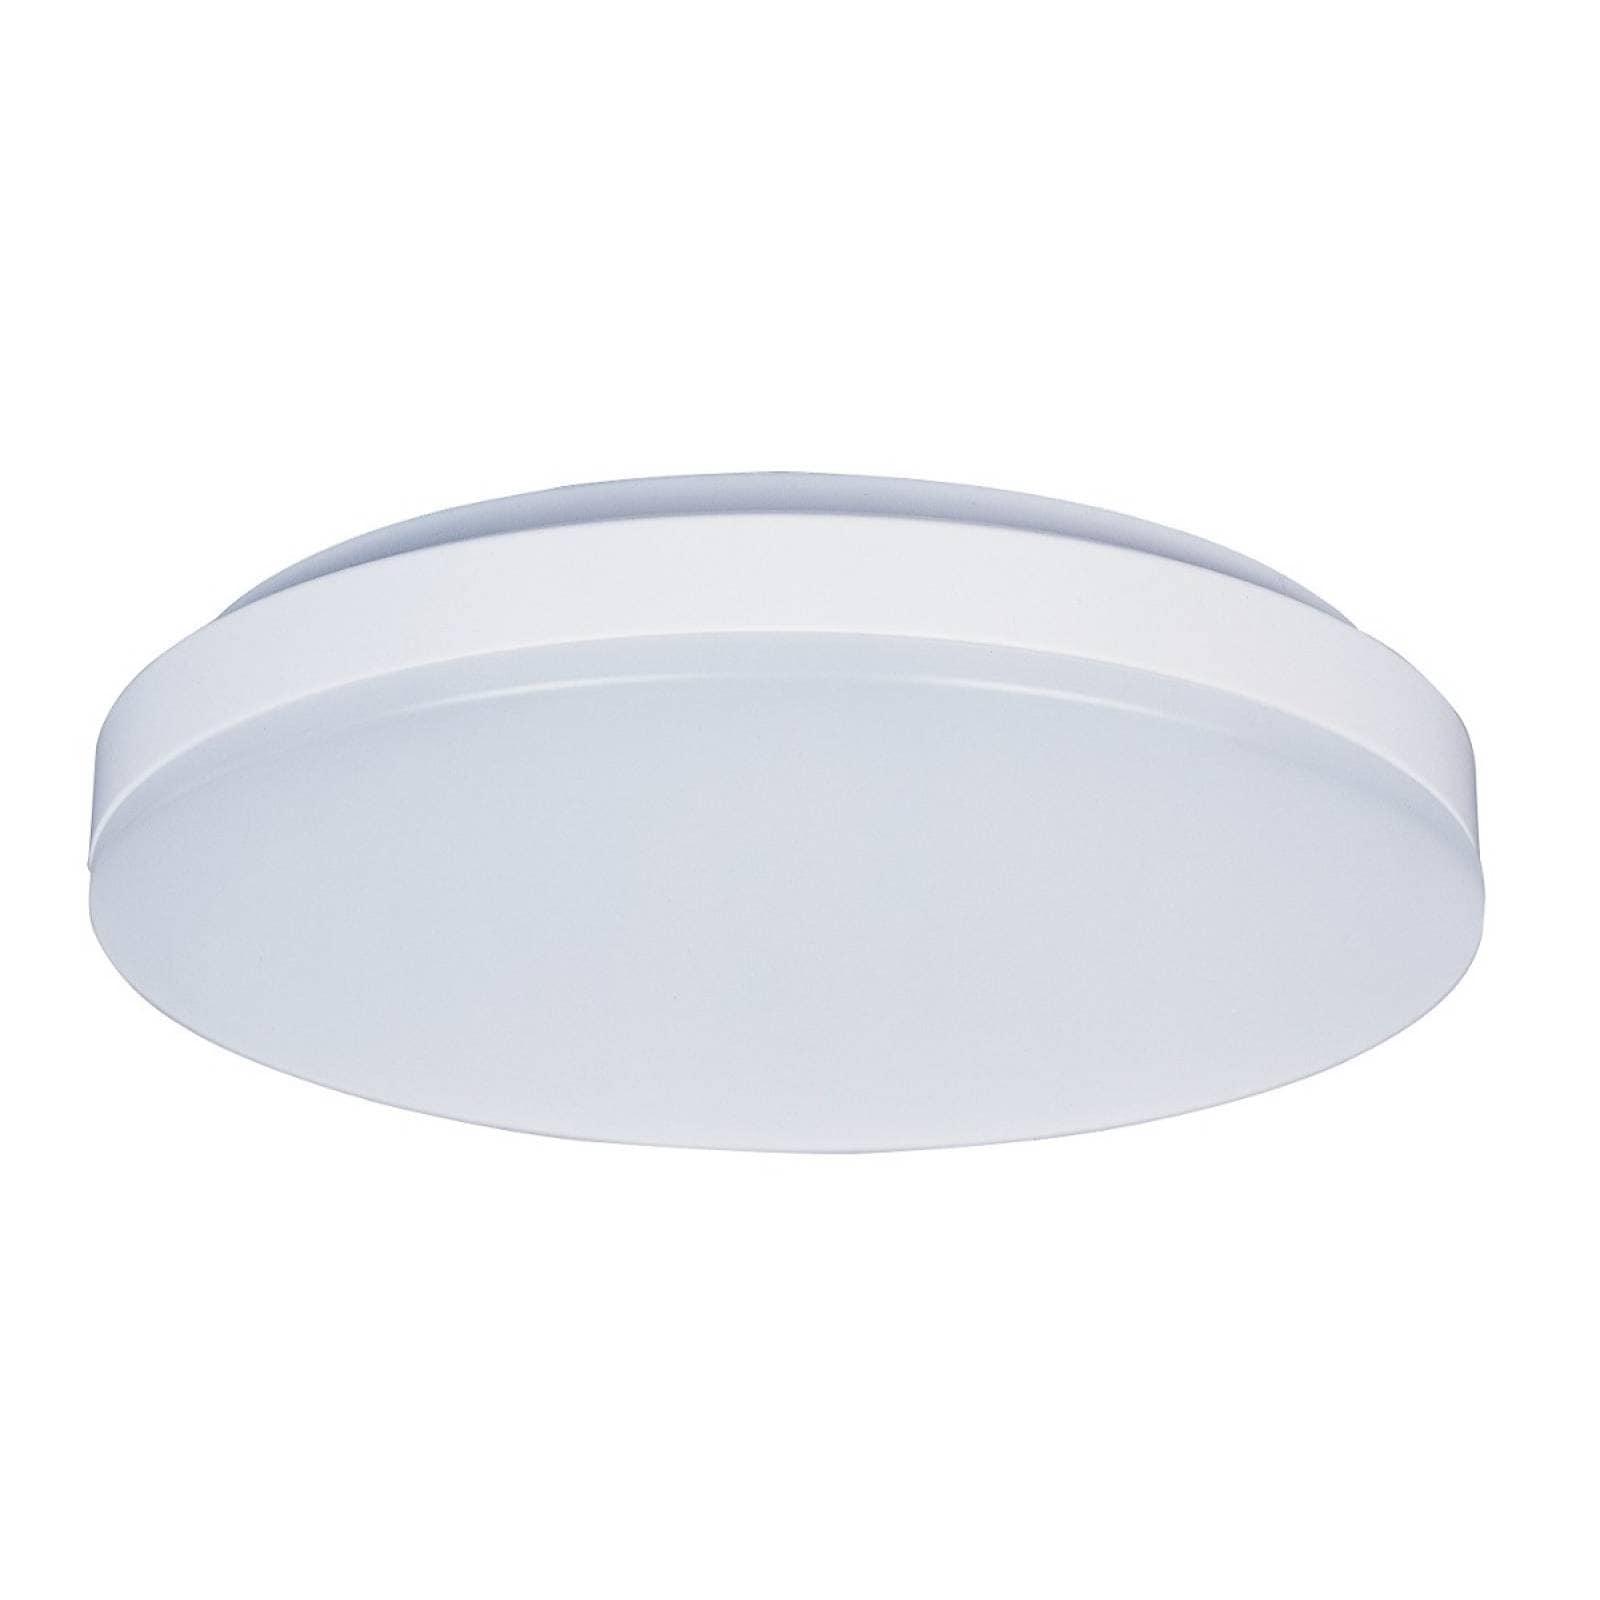 Lampara Led Techo Ceiling Empotrable Profile ee 12w Maxim